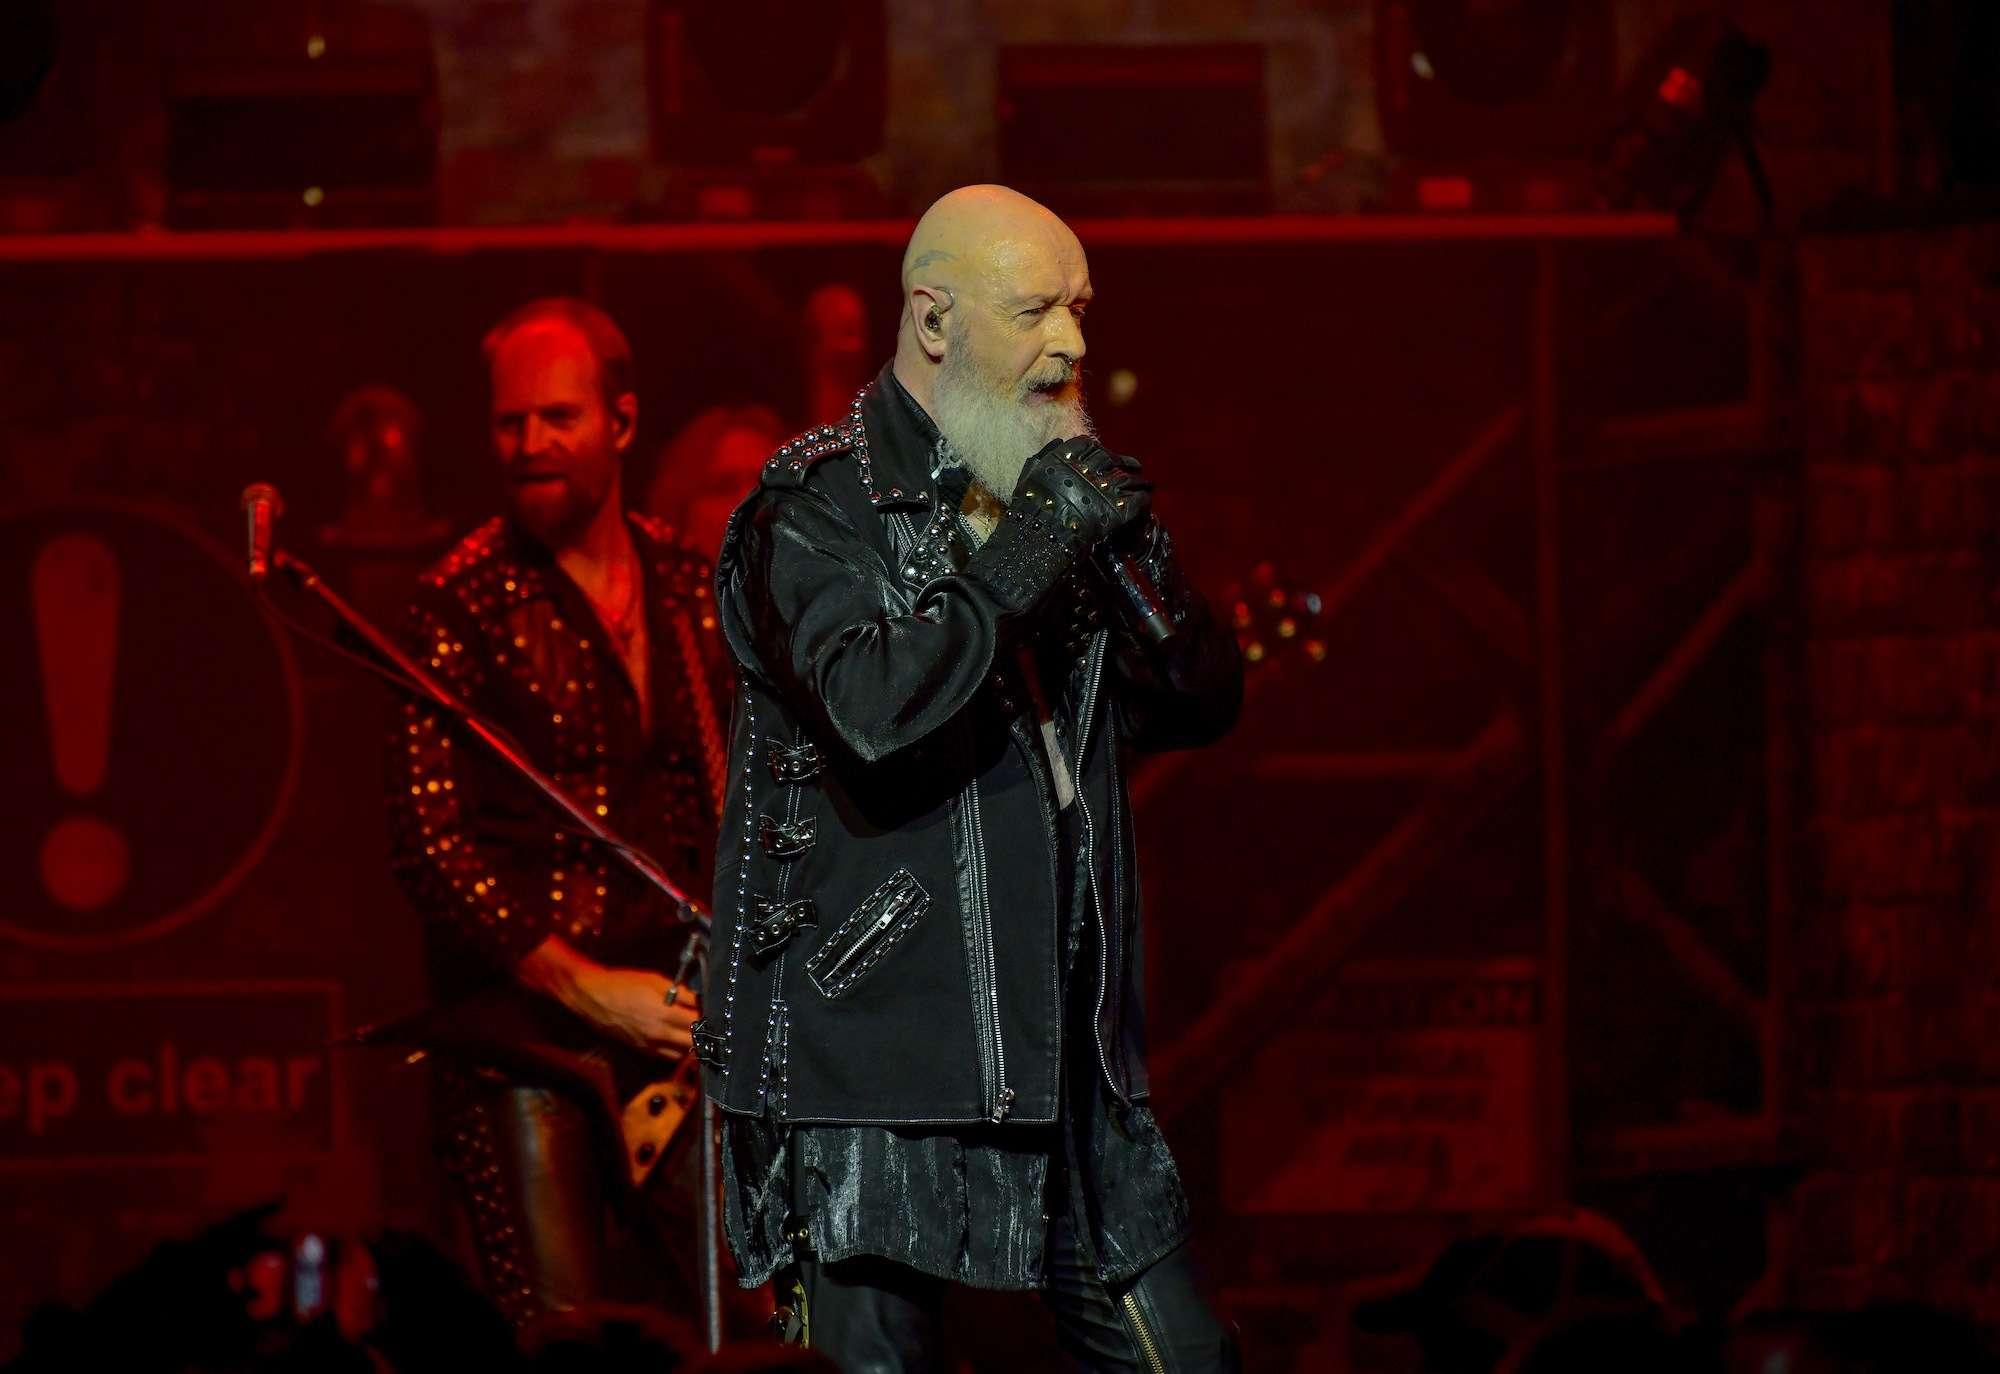 Judas Priest Live at Rosemont Theatre [GALLERY] 11